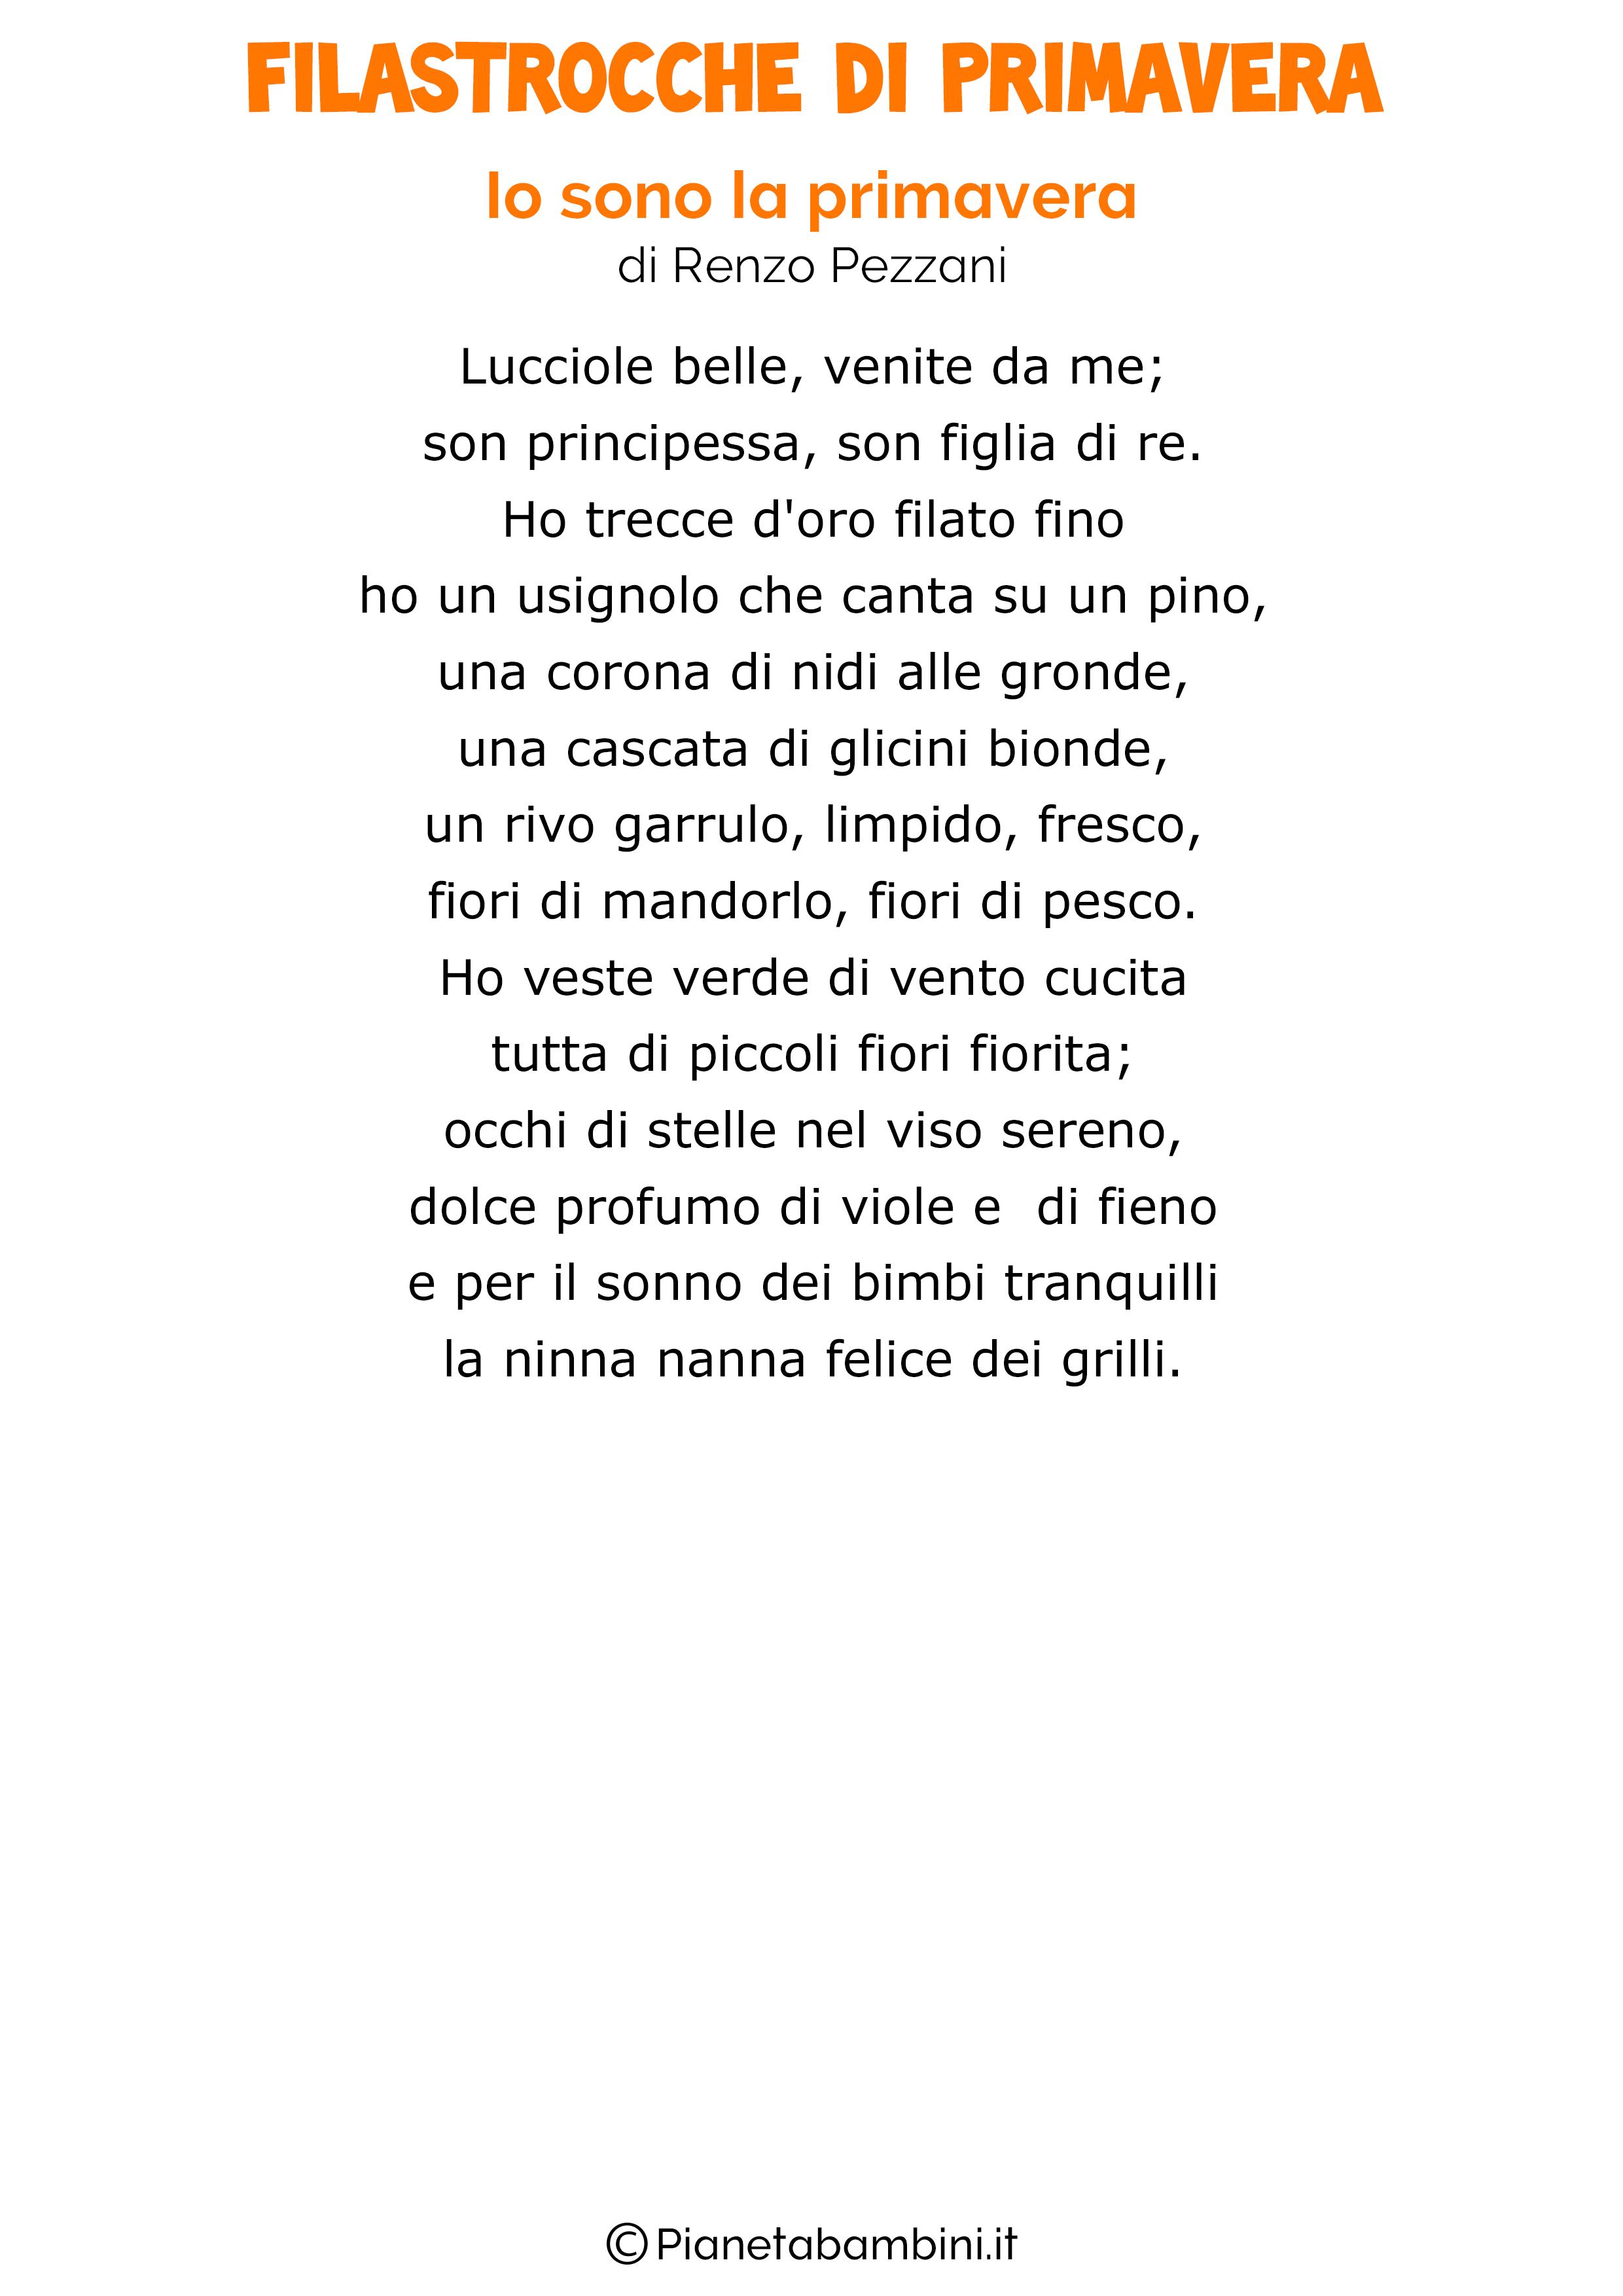 Io-sono-la-primavera-Renzo-Pezzani